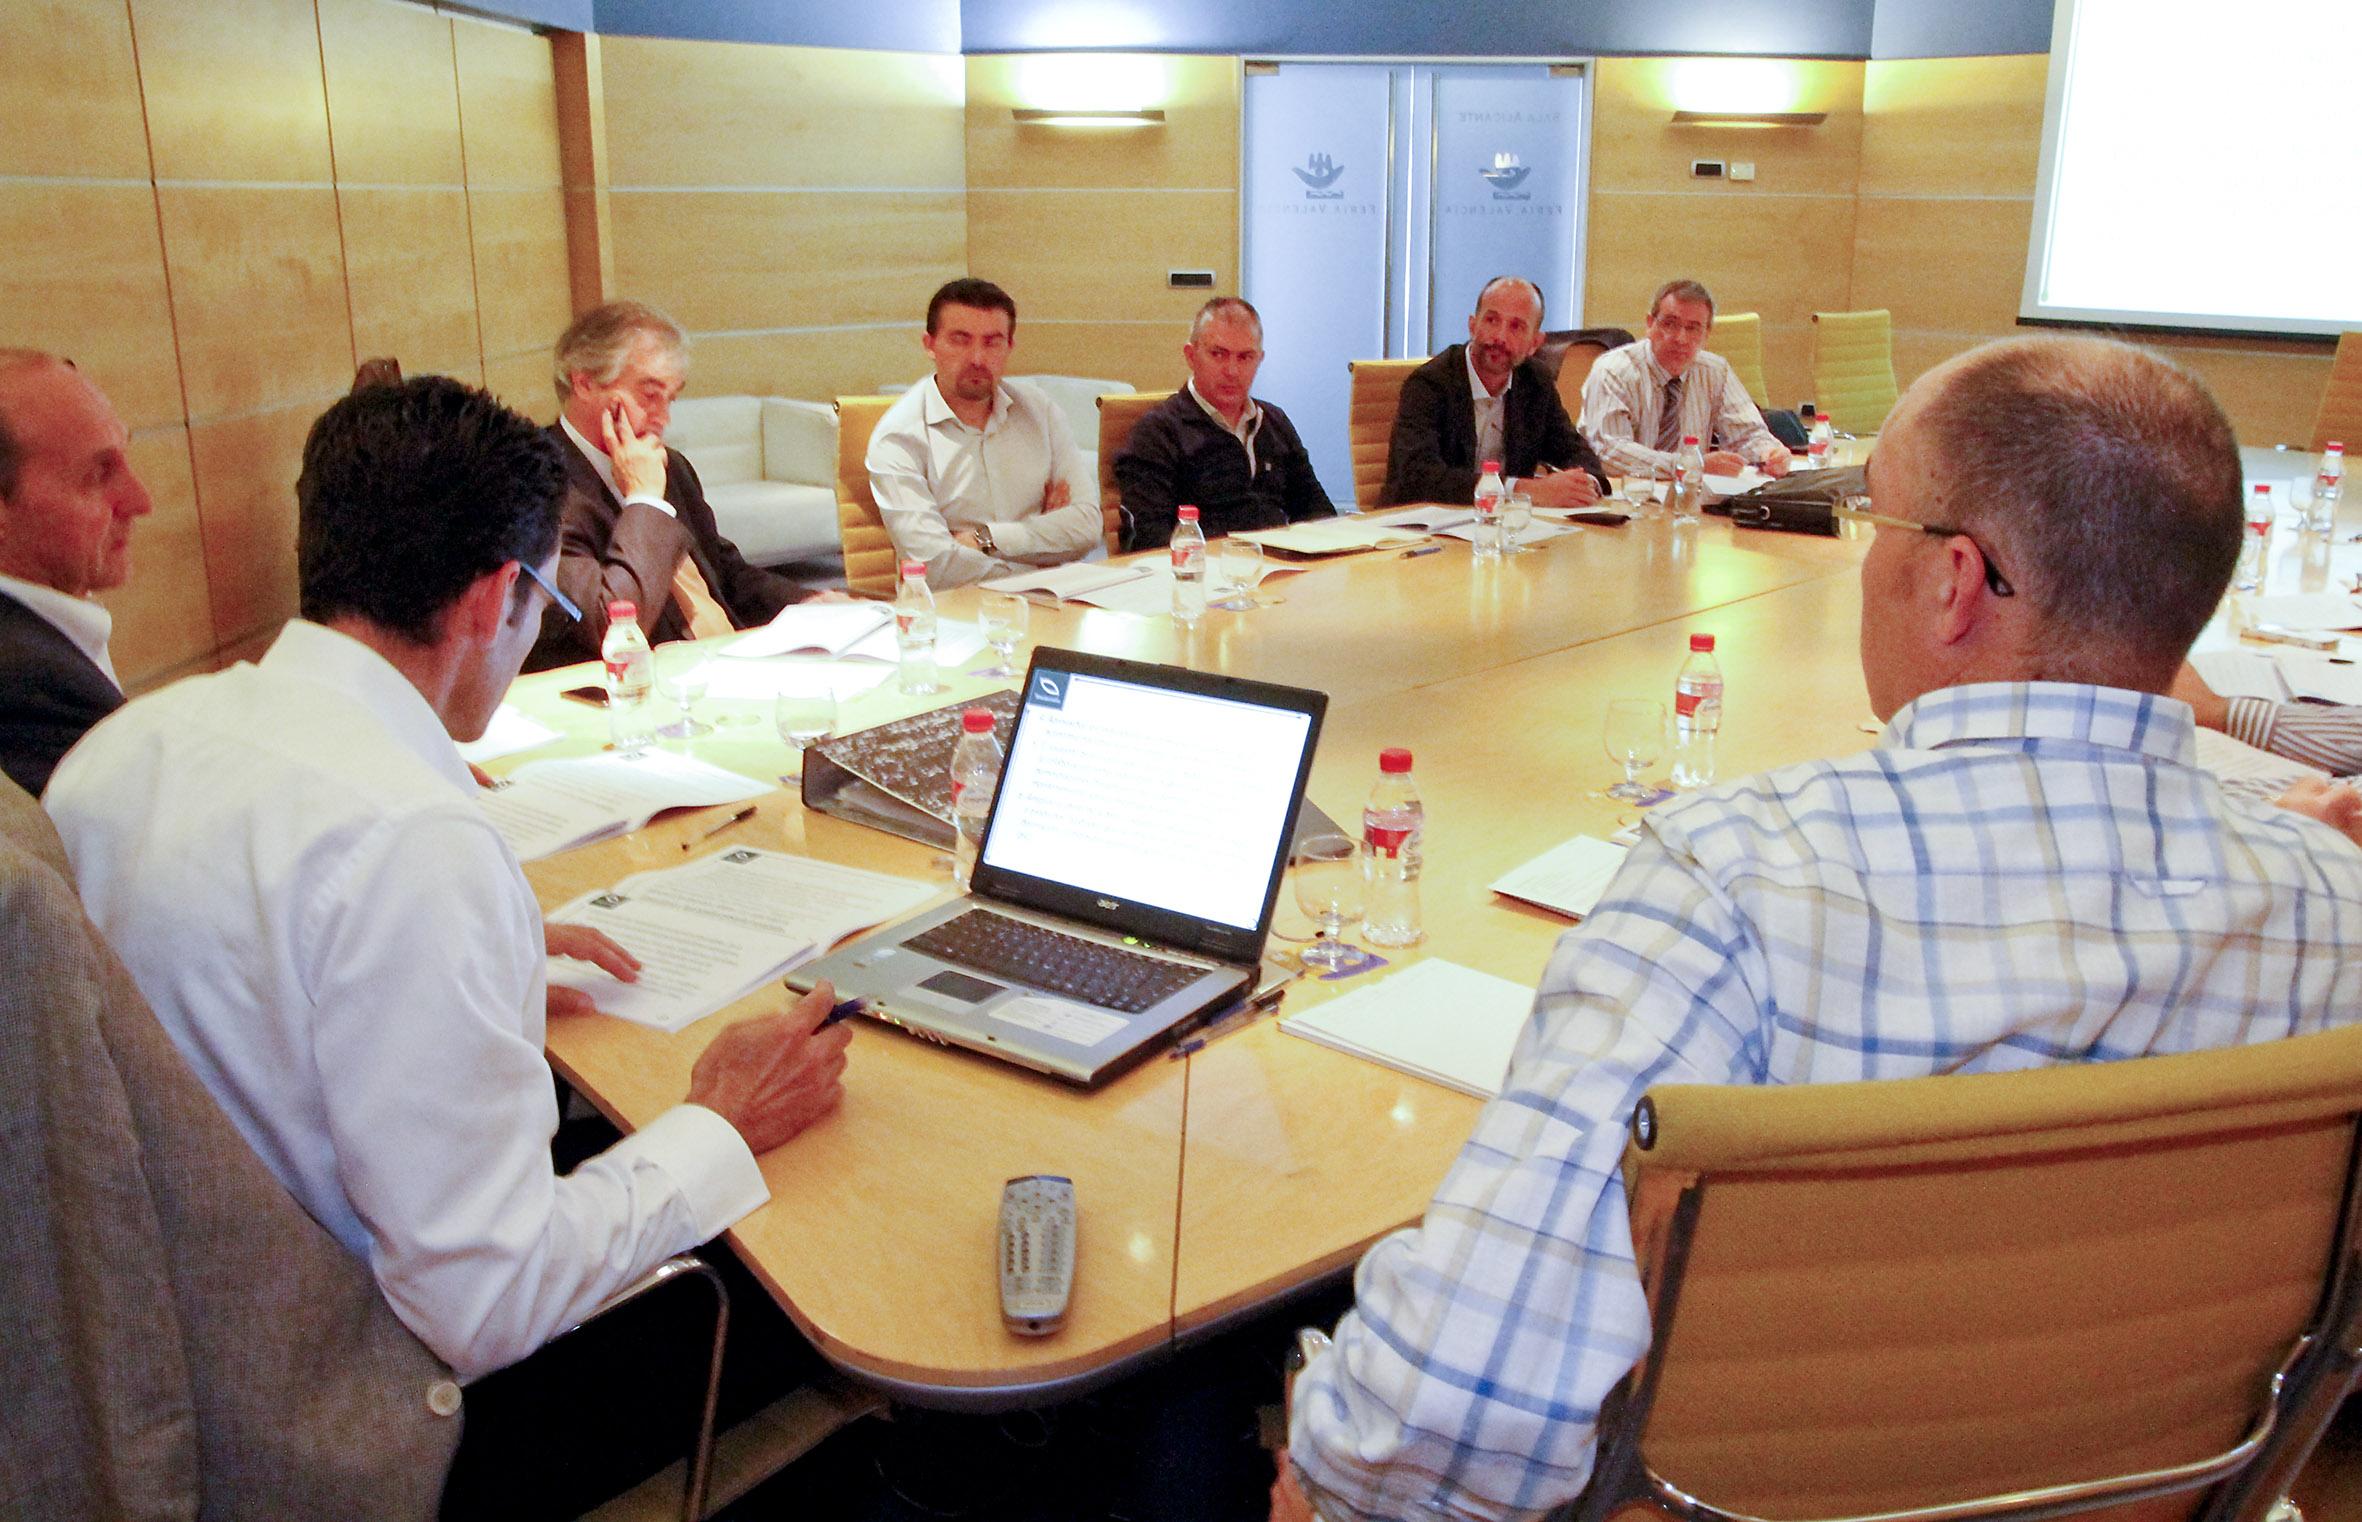 Primera reunión del Comité Organizador de Maderalia 2016